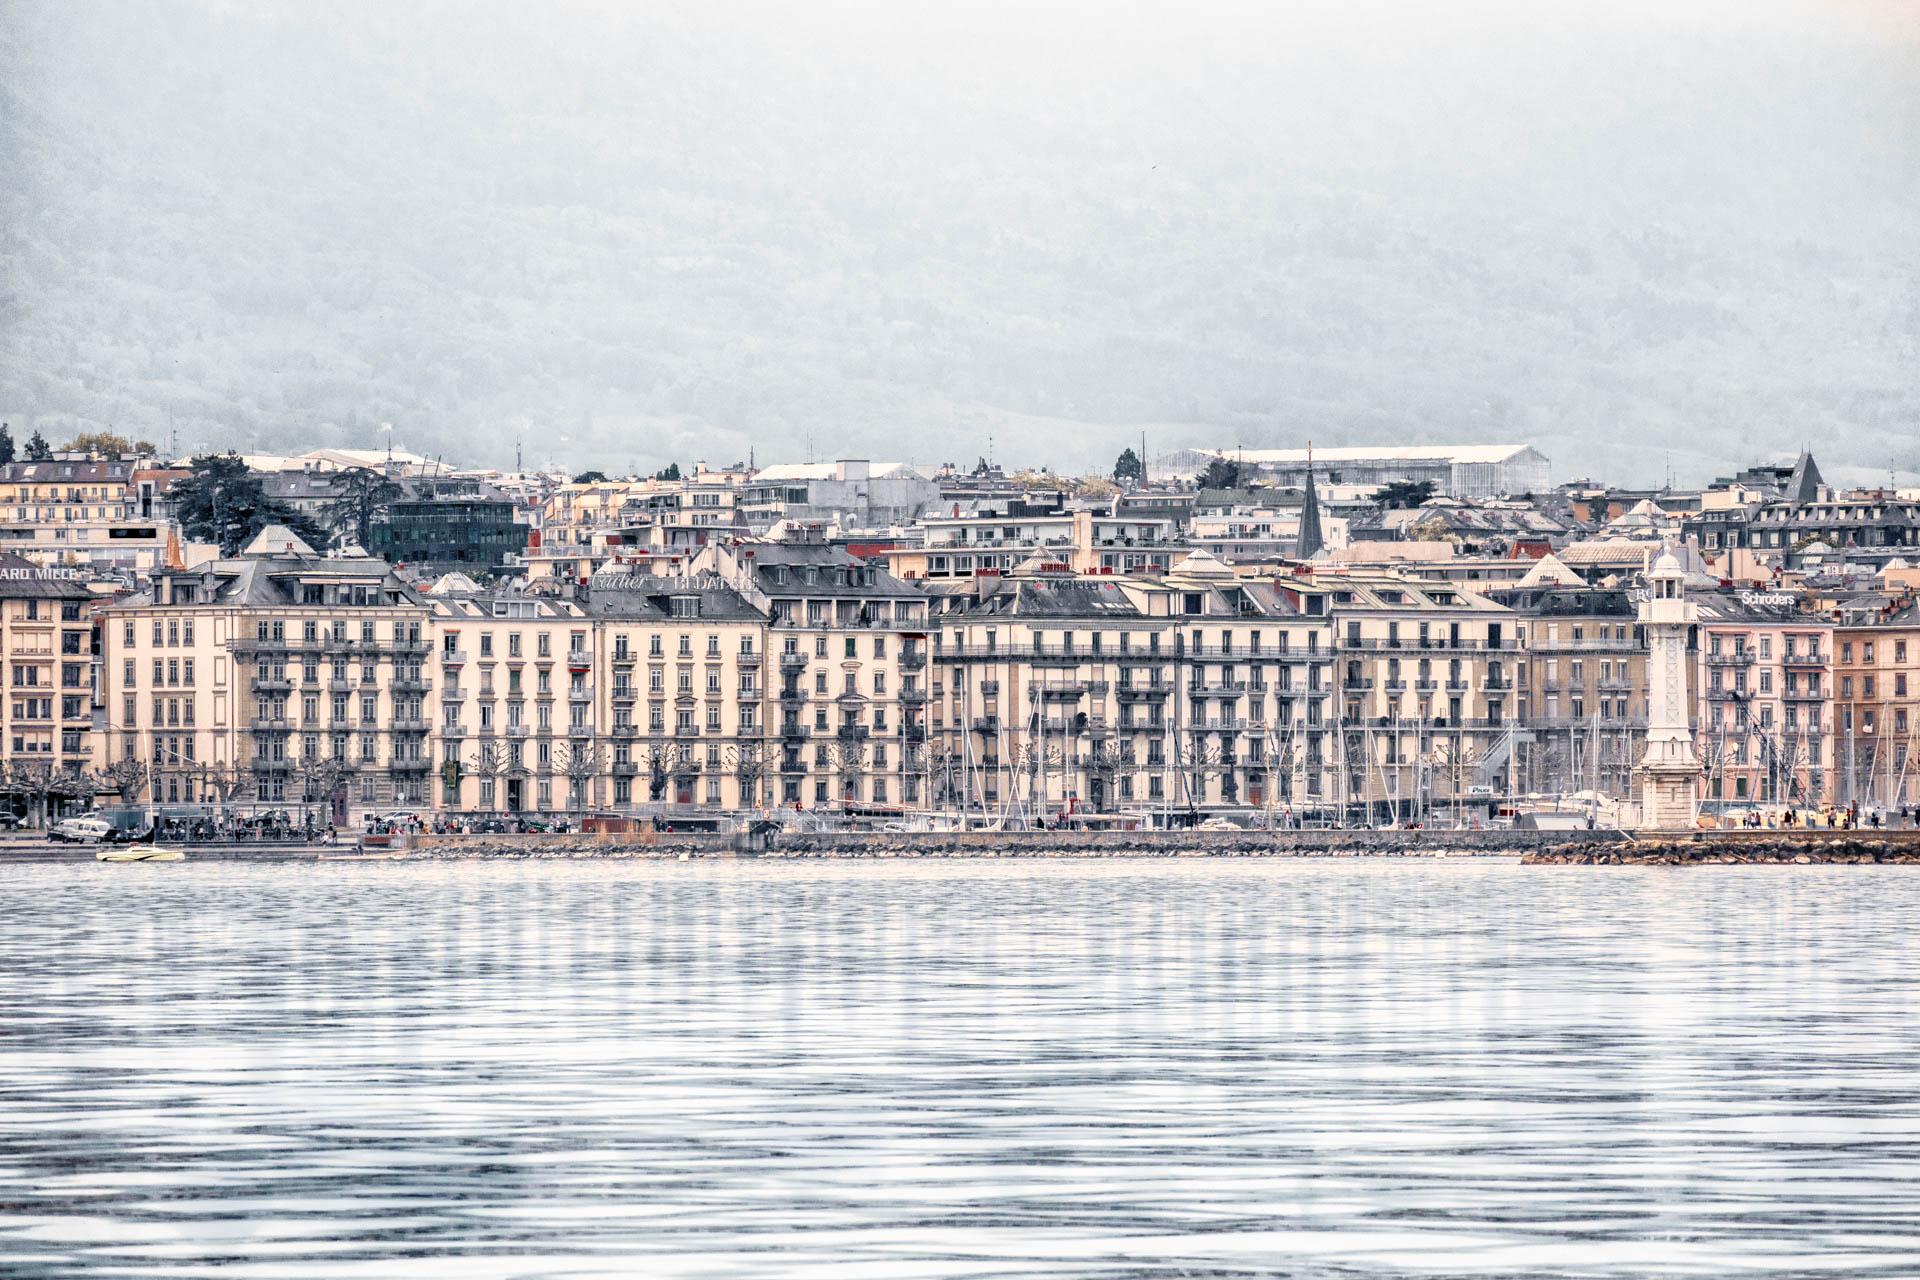 Genève2018-still21.jpg